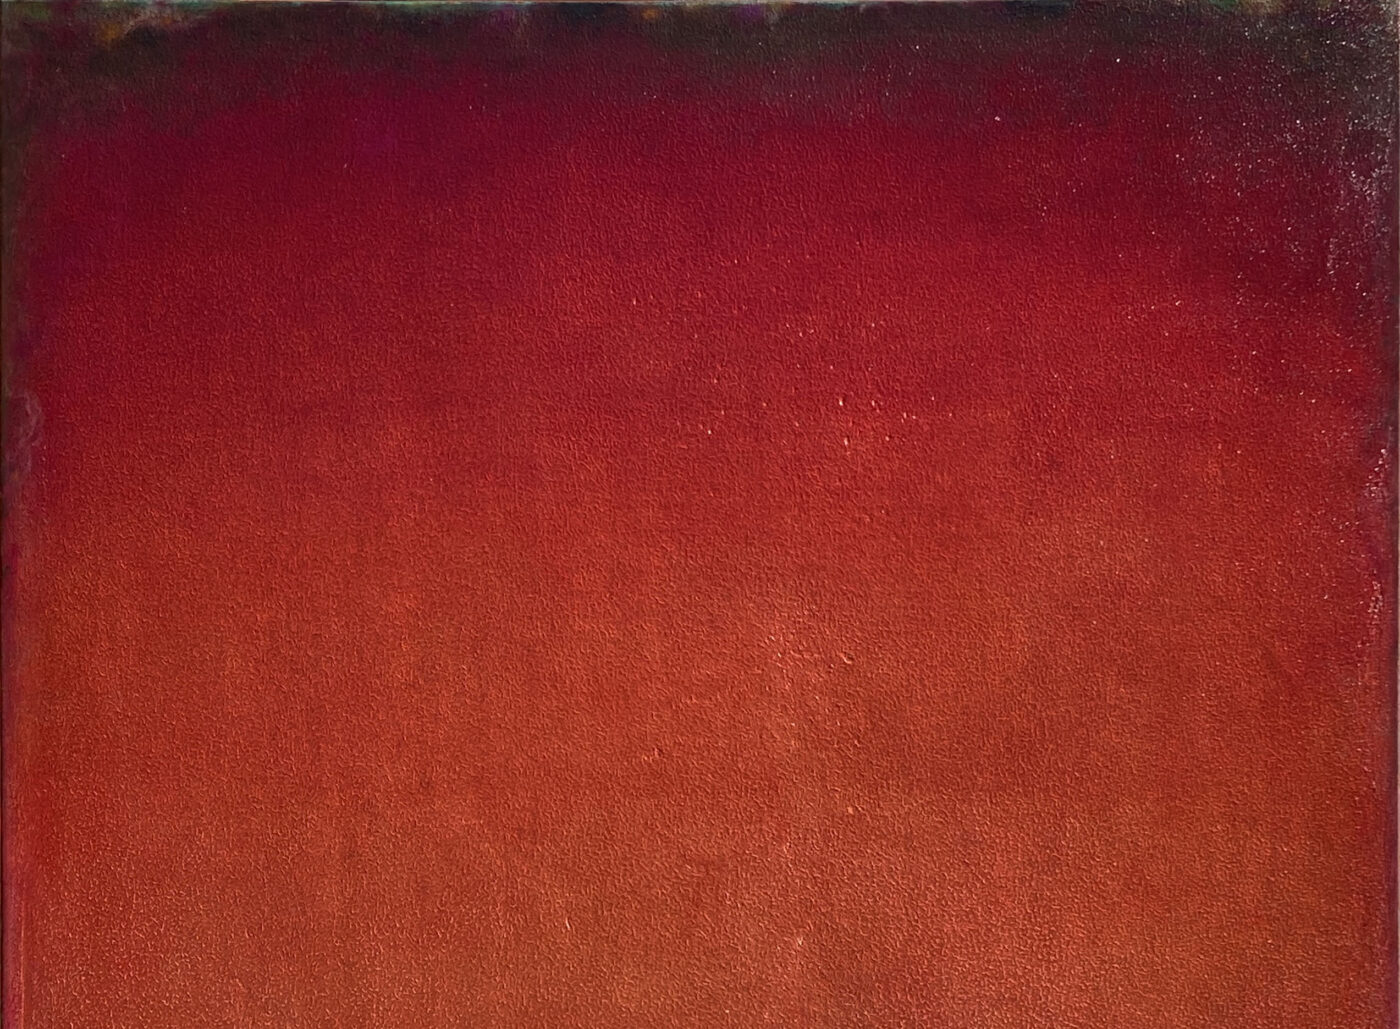 Tom Kirby, abstract minimalist